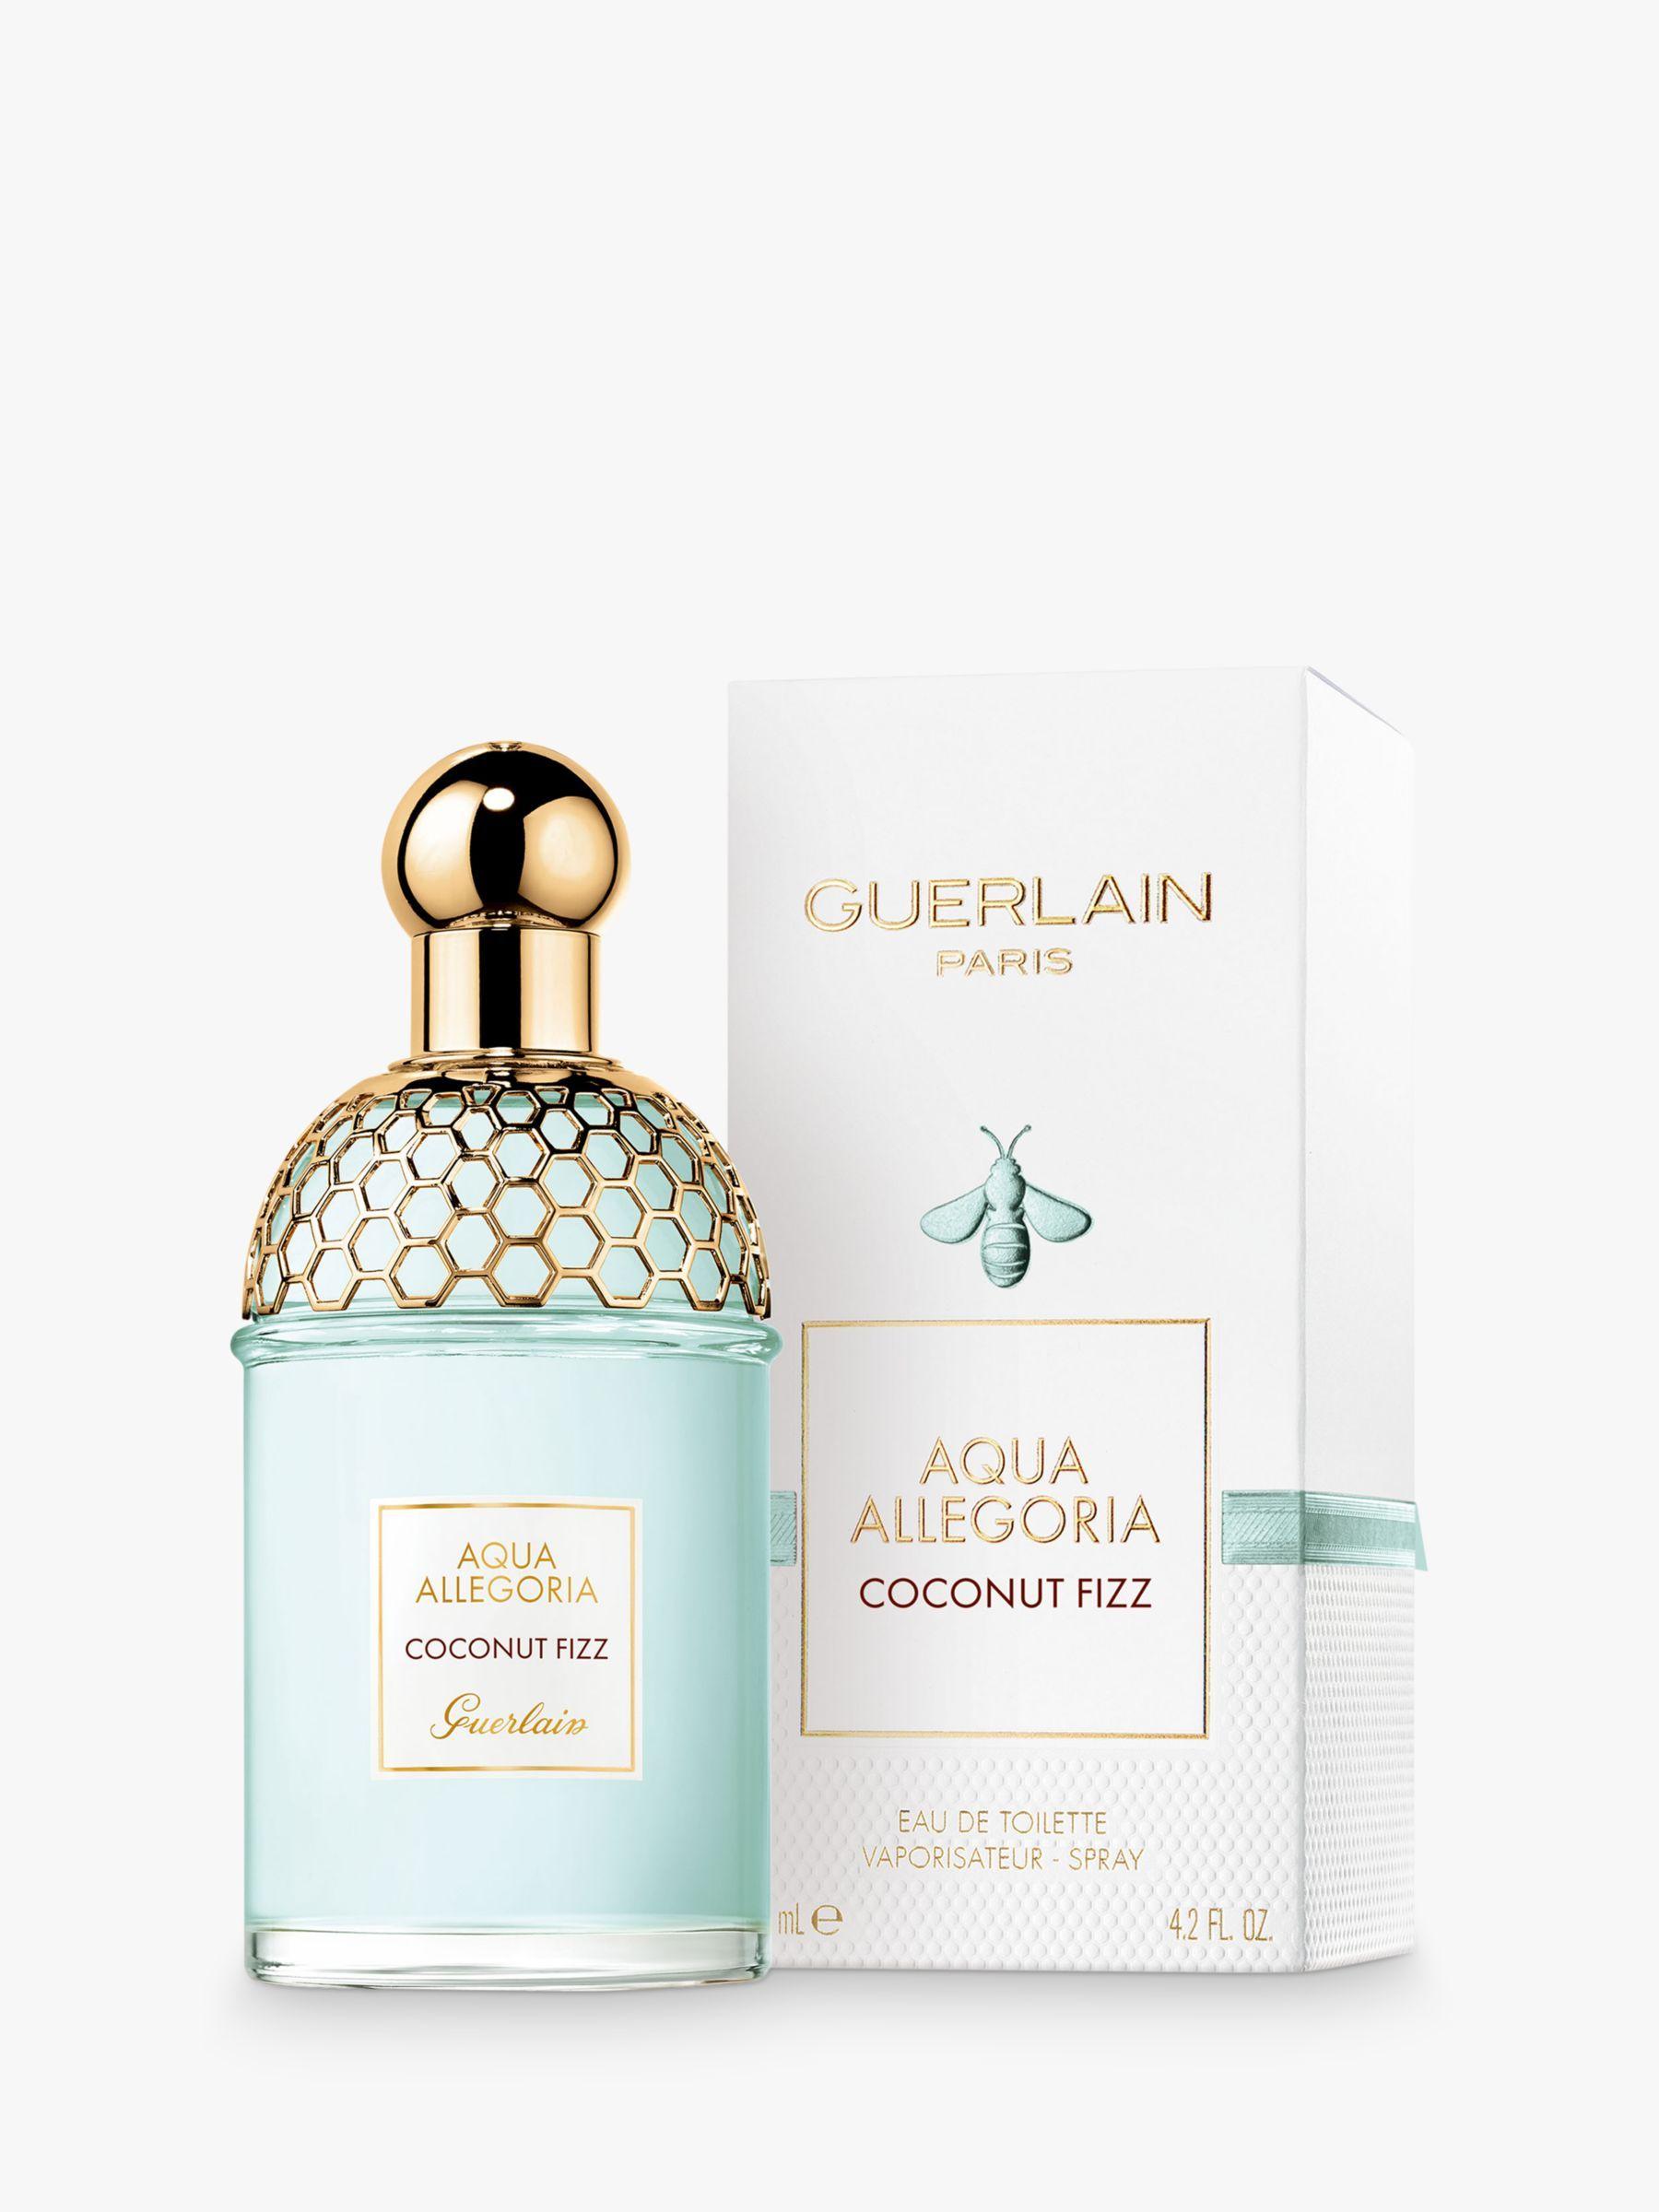 Guerlain Aqua Allegoria Coconut Fizz Eau de Toilette, 75ml